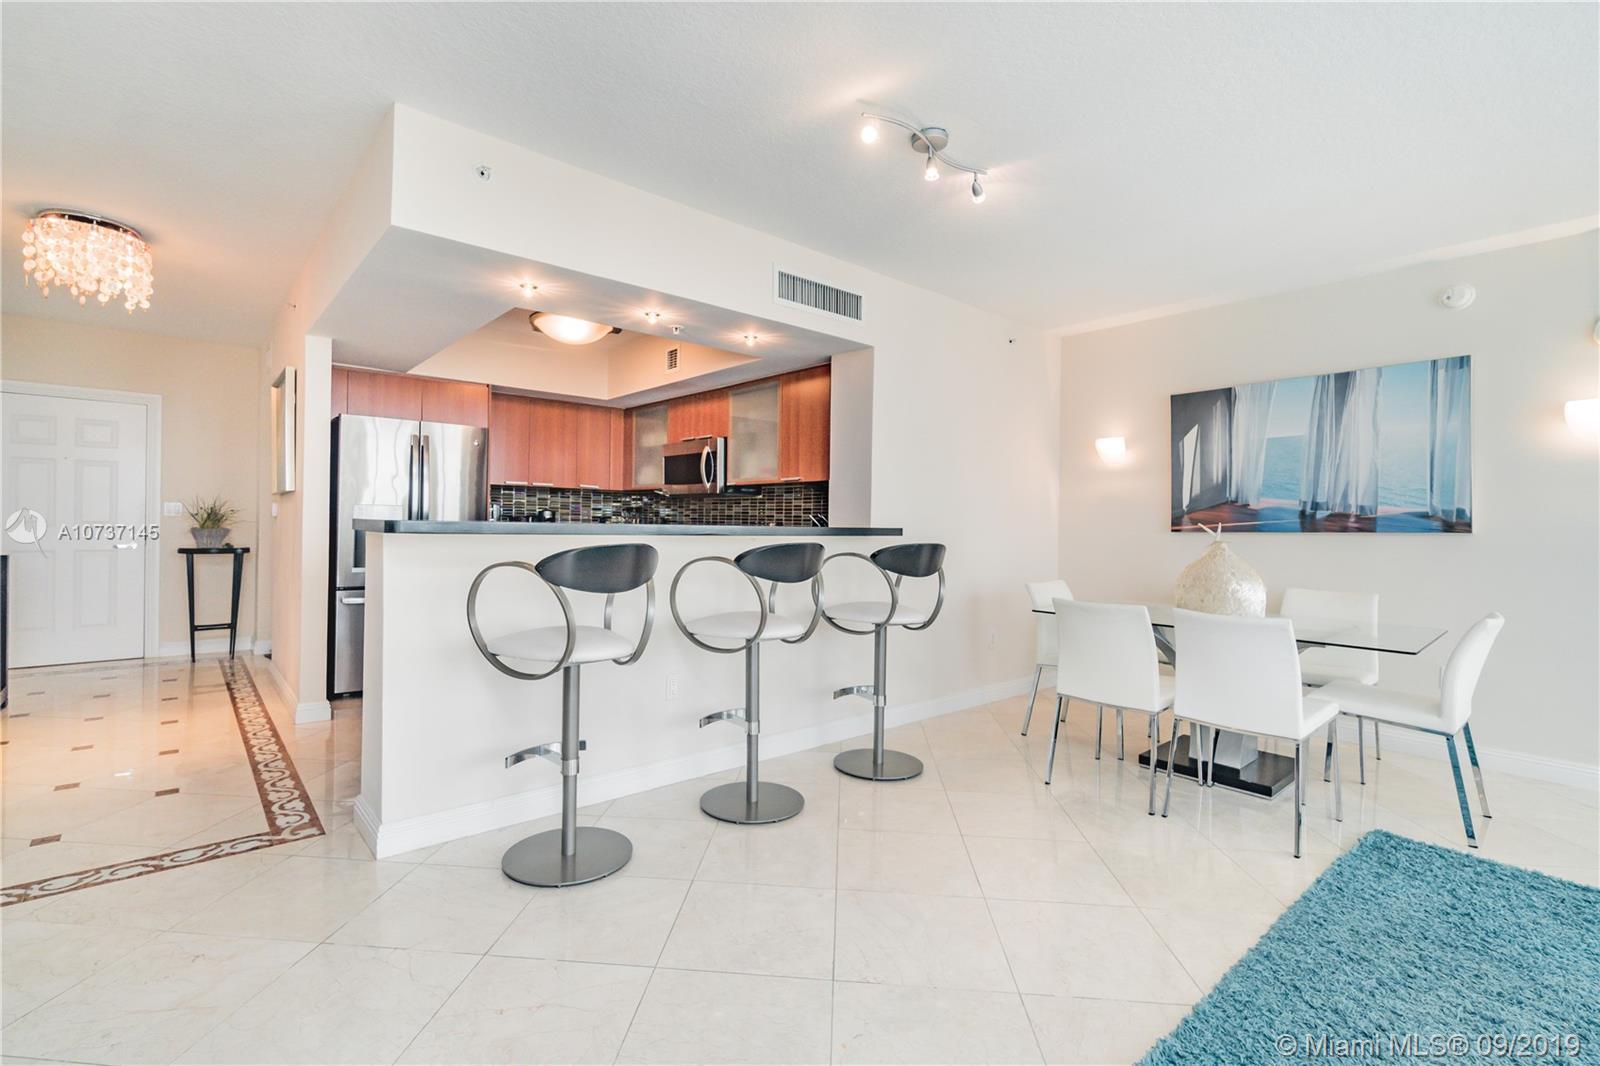 La Perla #2907 - 16699 Collins Ave/BEST UNIT #2907, Sunny Isles Beach, FL 33160